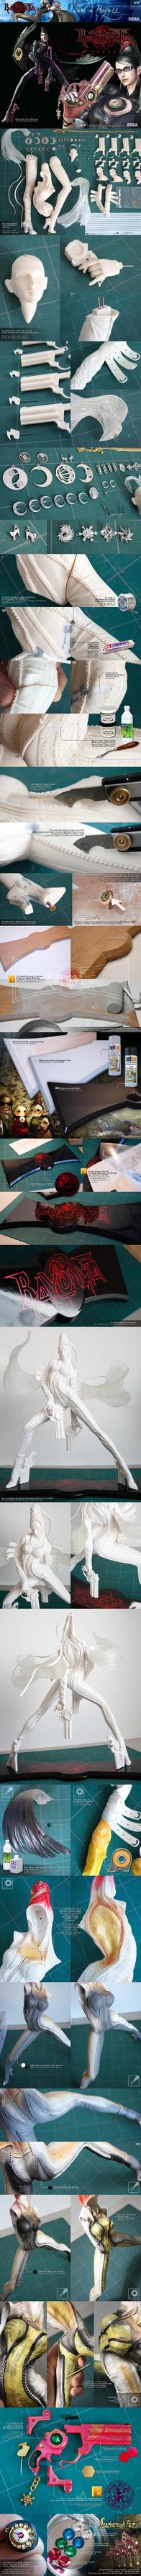 1-4 Bayonetta WIP by ogamitaicho